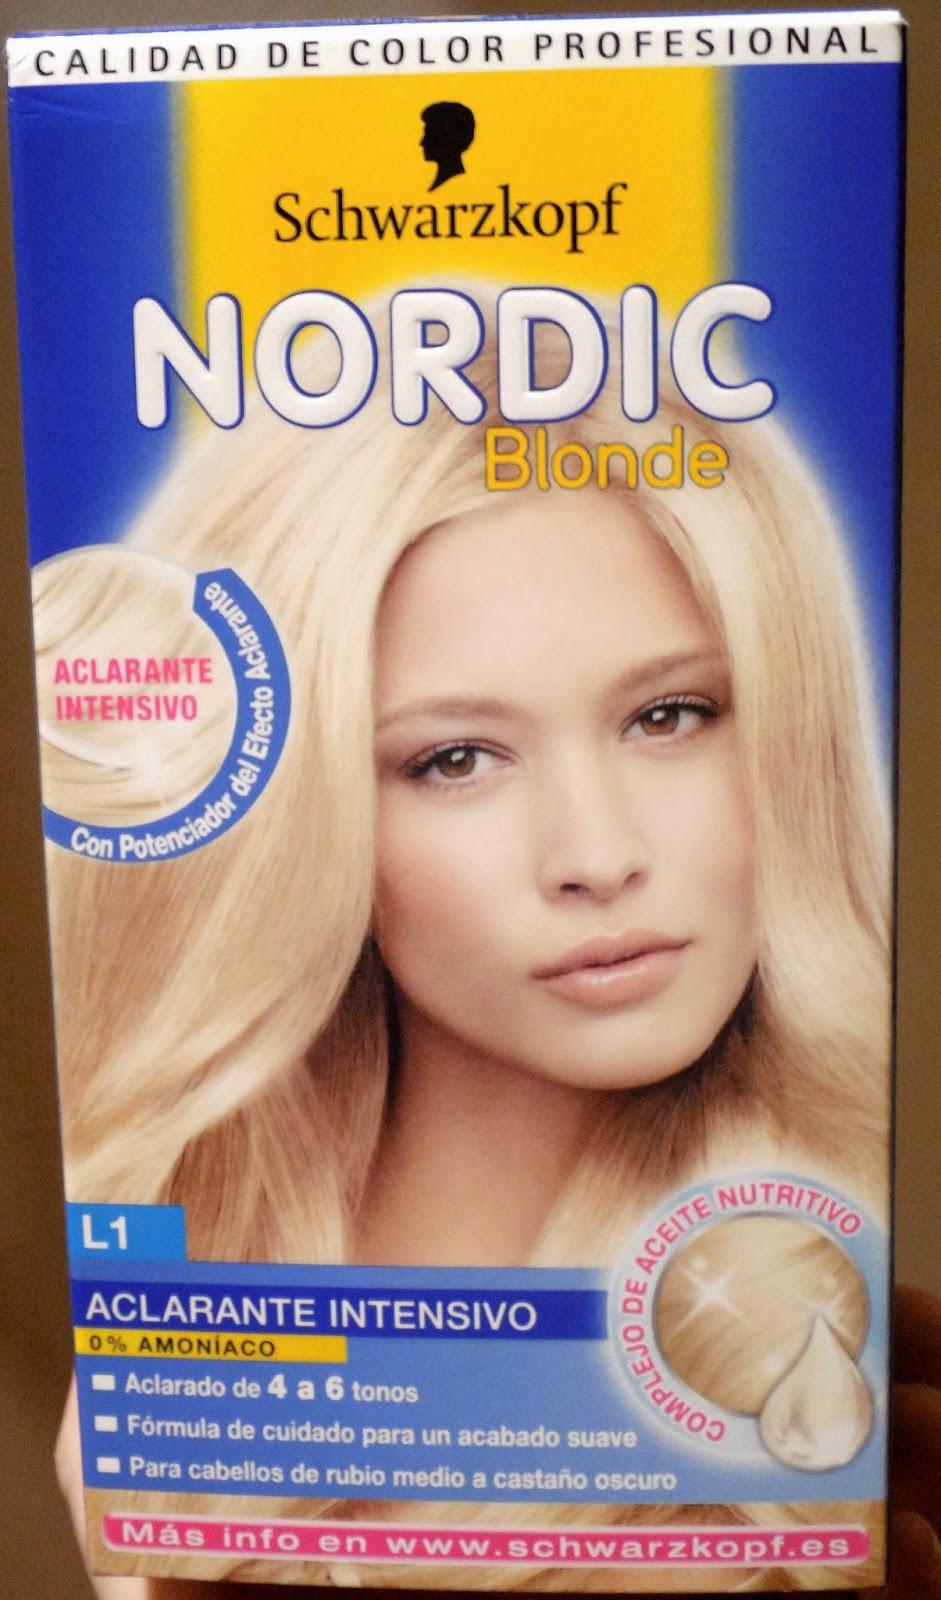 Schwarzkopf Nordic Blonde L1